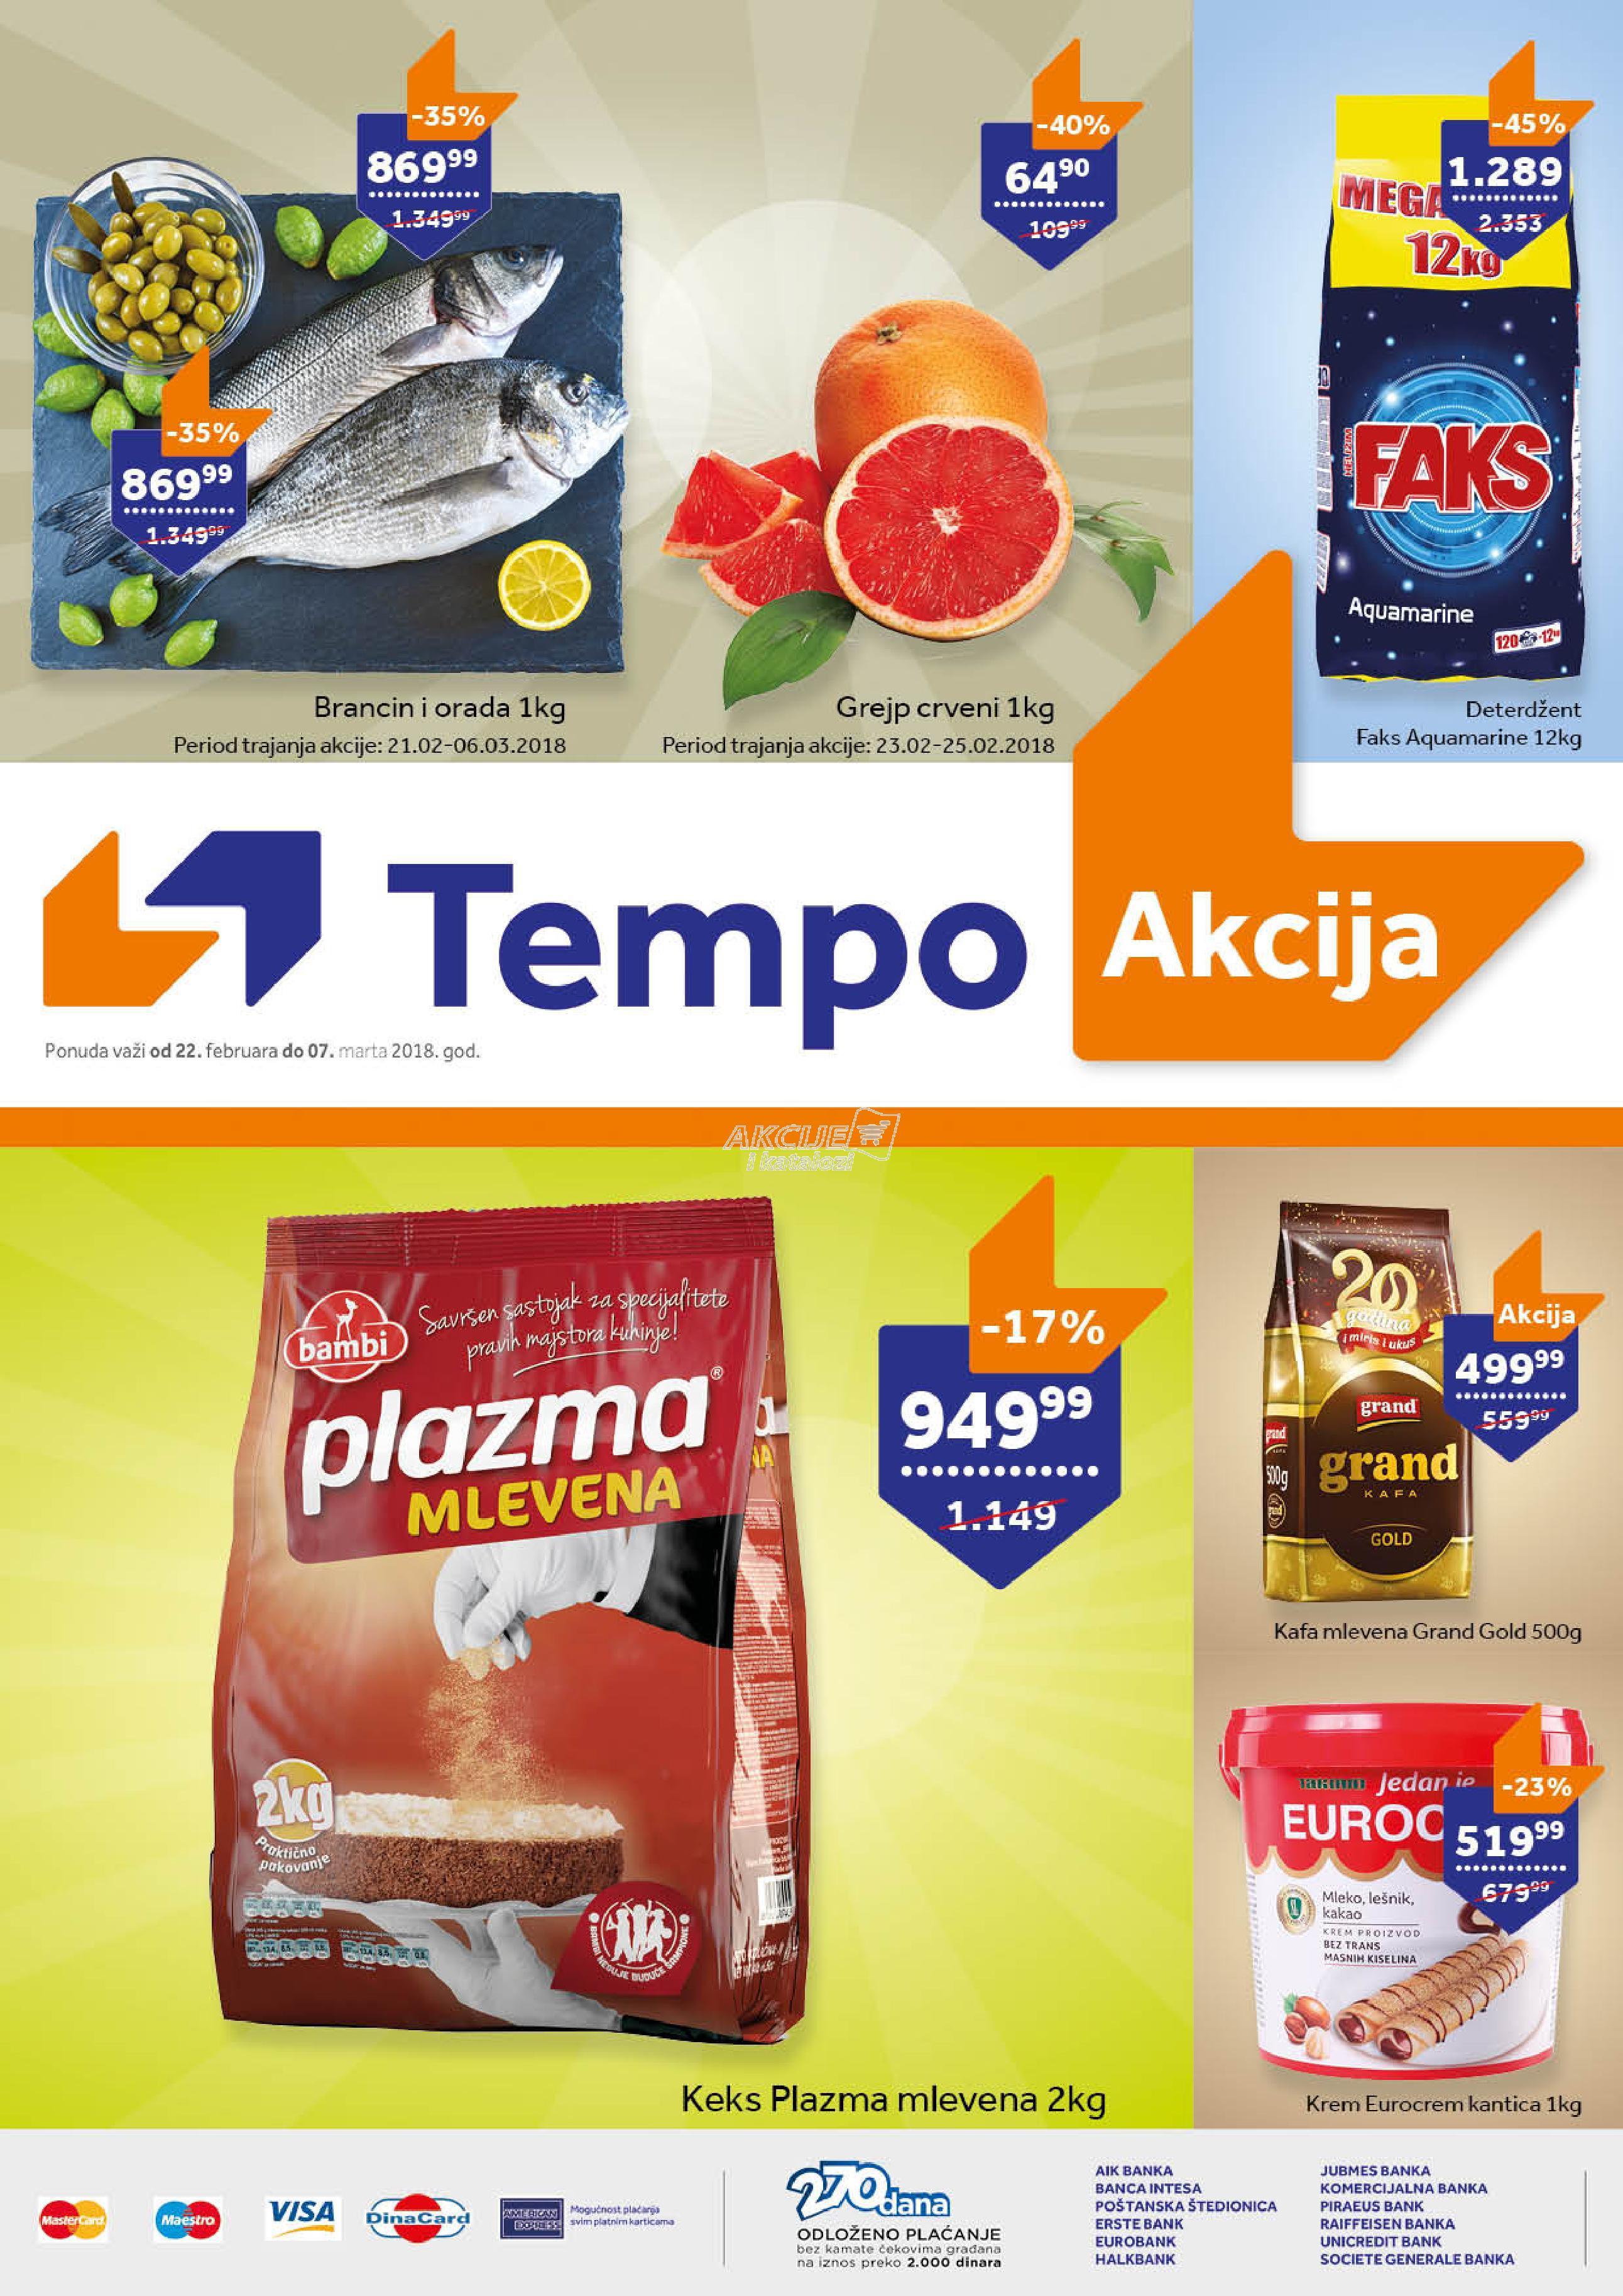 Tempo - Redovna akcija super cena